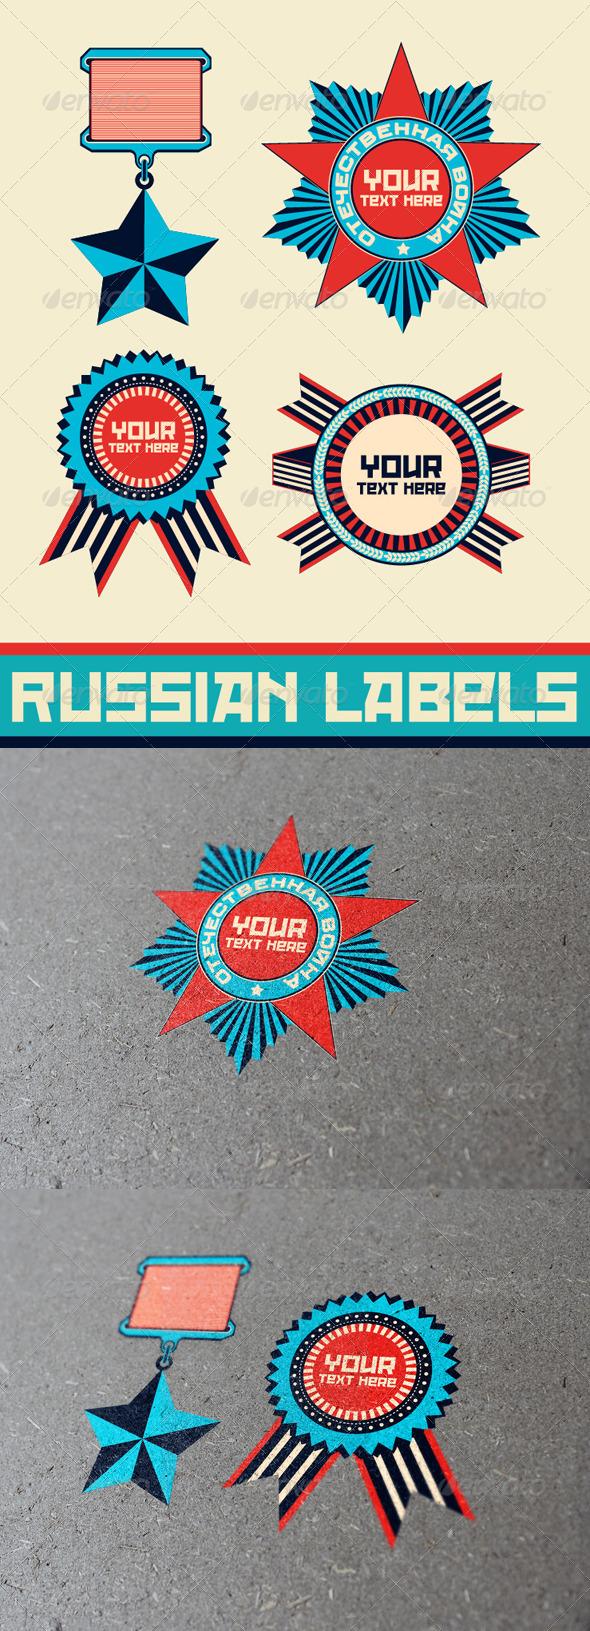 Russian Vintage Labels, Awards - Vectors